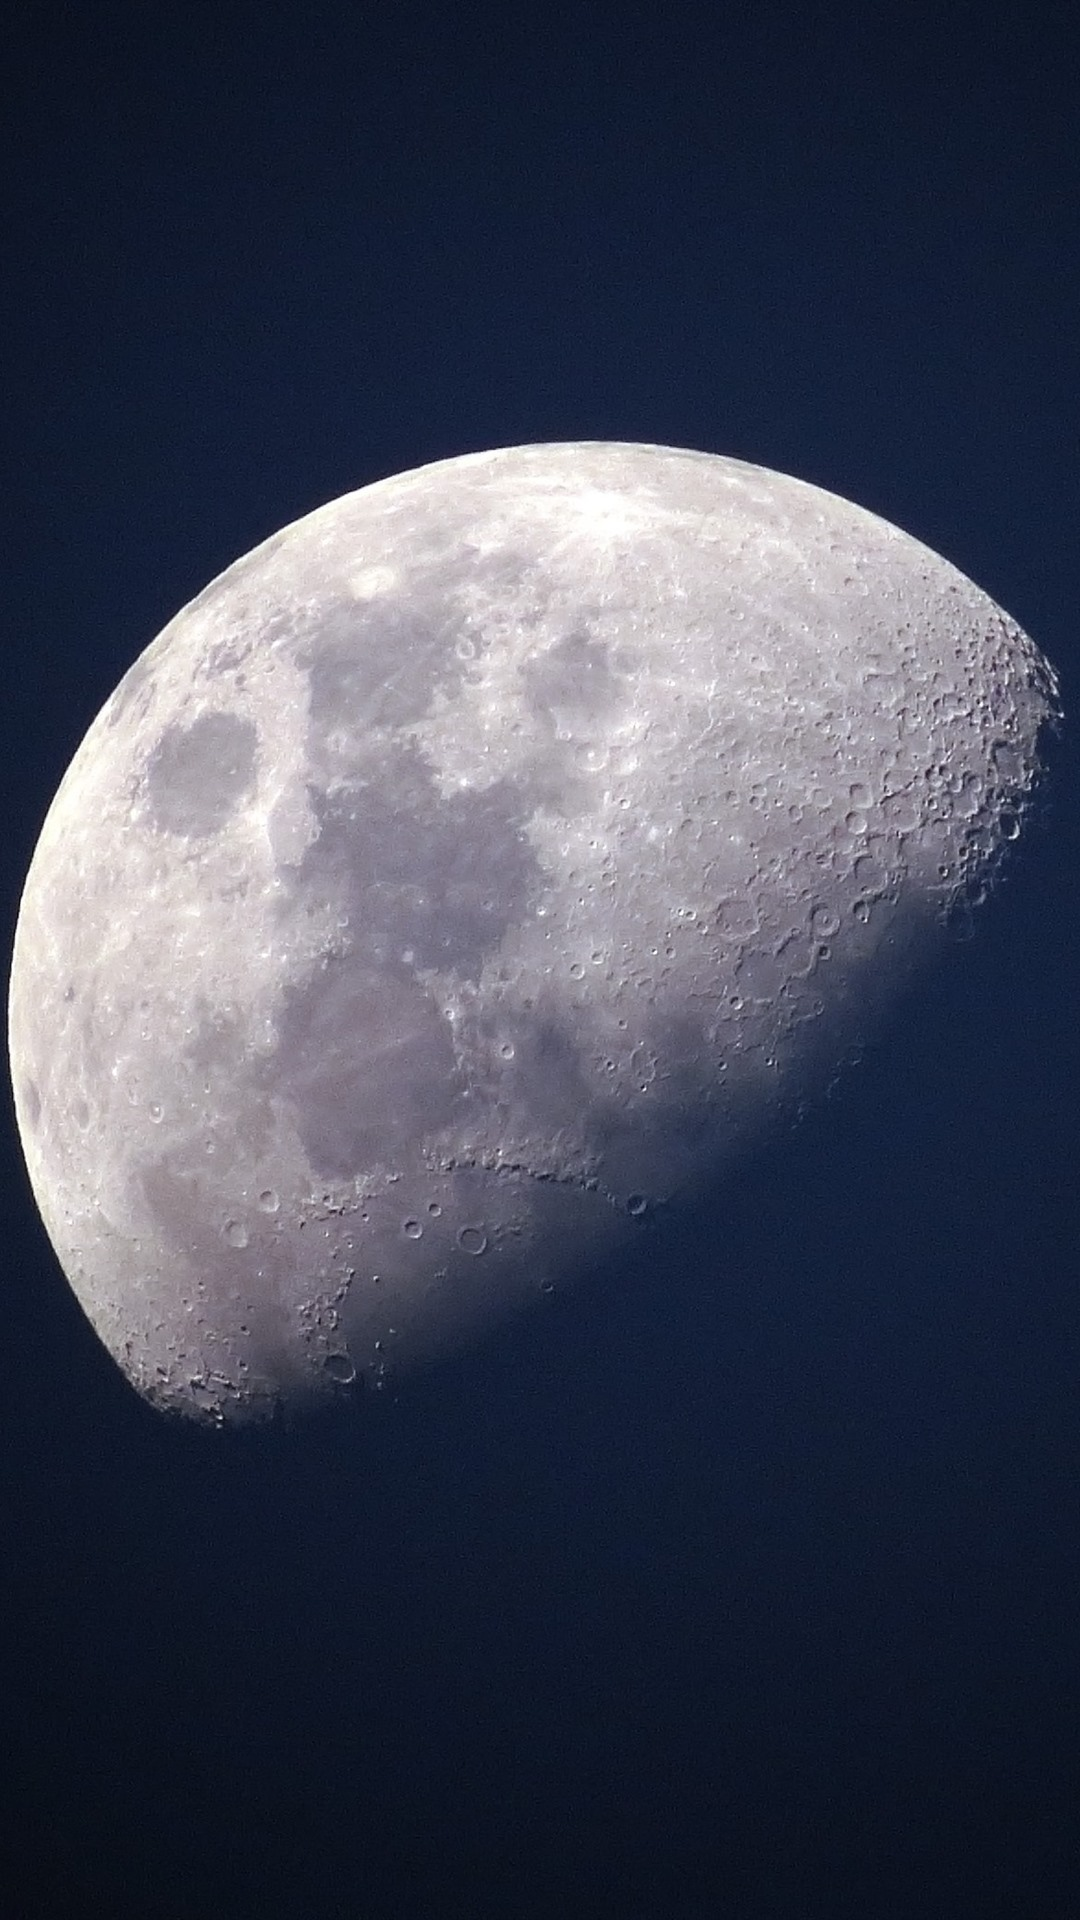 Moon Universe Black Background 1080x1920 Iphone 8 7 6 6s